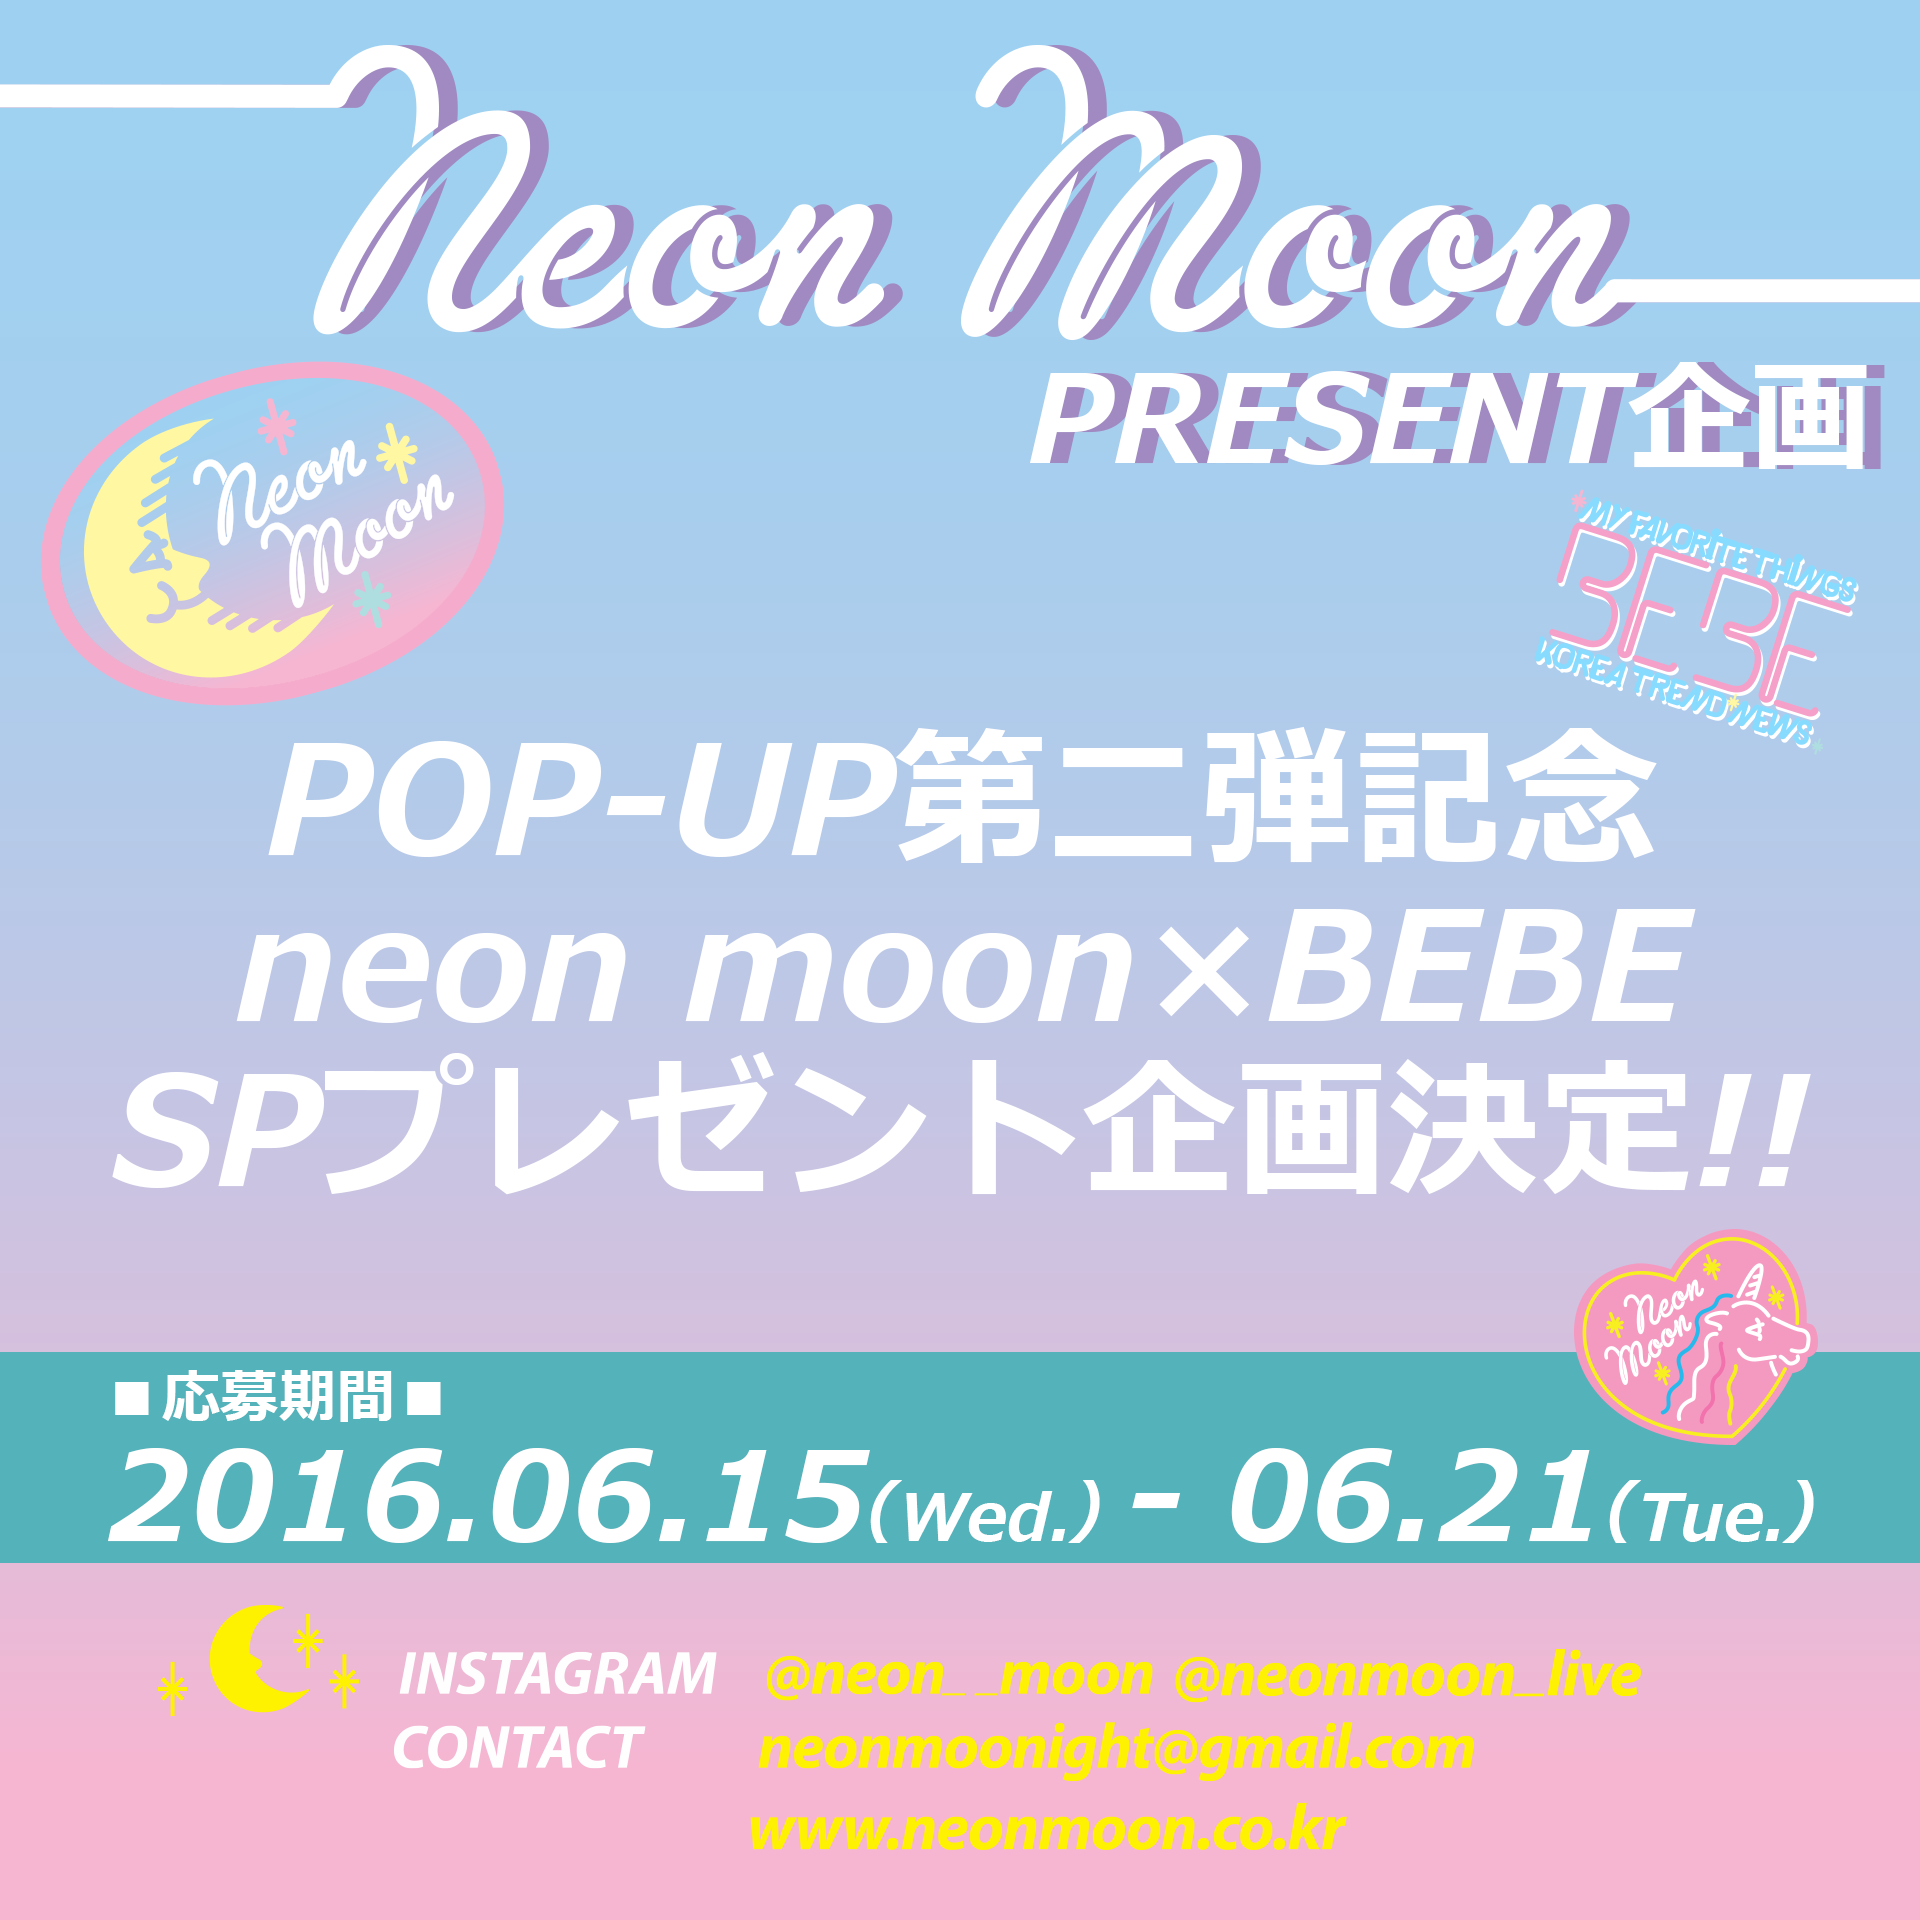 neonmoon BEBE present